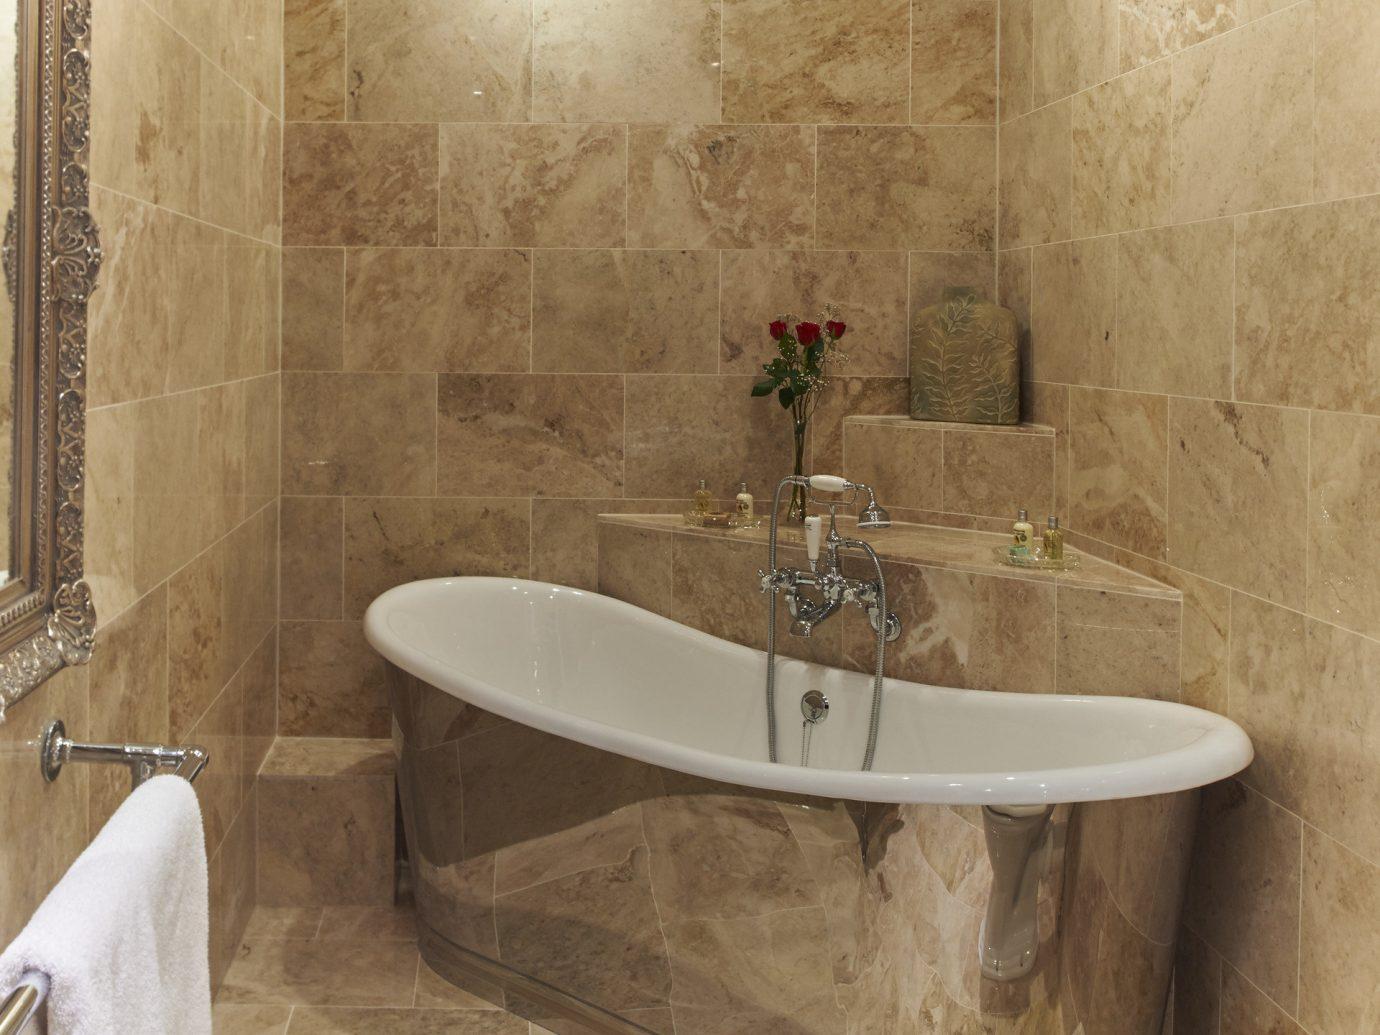 Trip Ideas wall indoor bathroom room bathtub toilet plumbing fixture floor vessel tub tile flooring sink interior design bidet Bath water basin tiled stone dirty